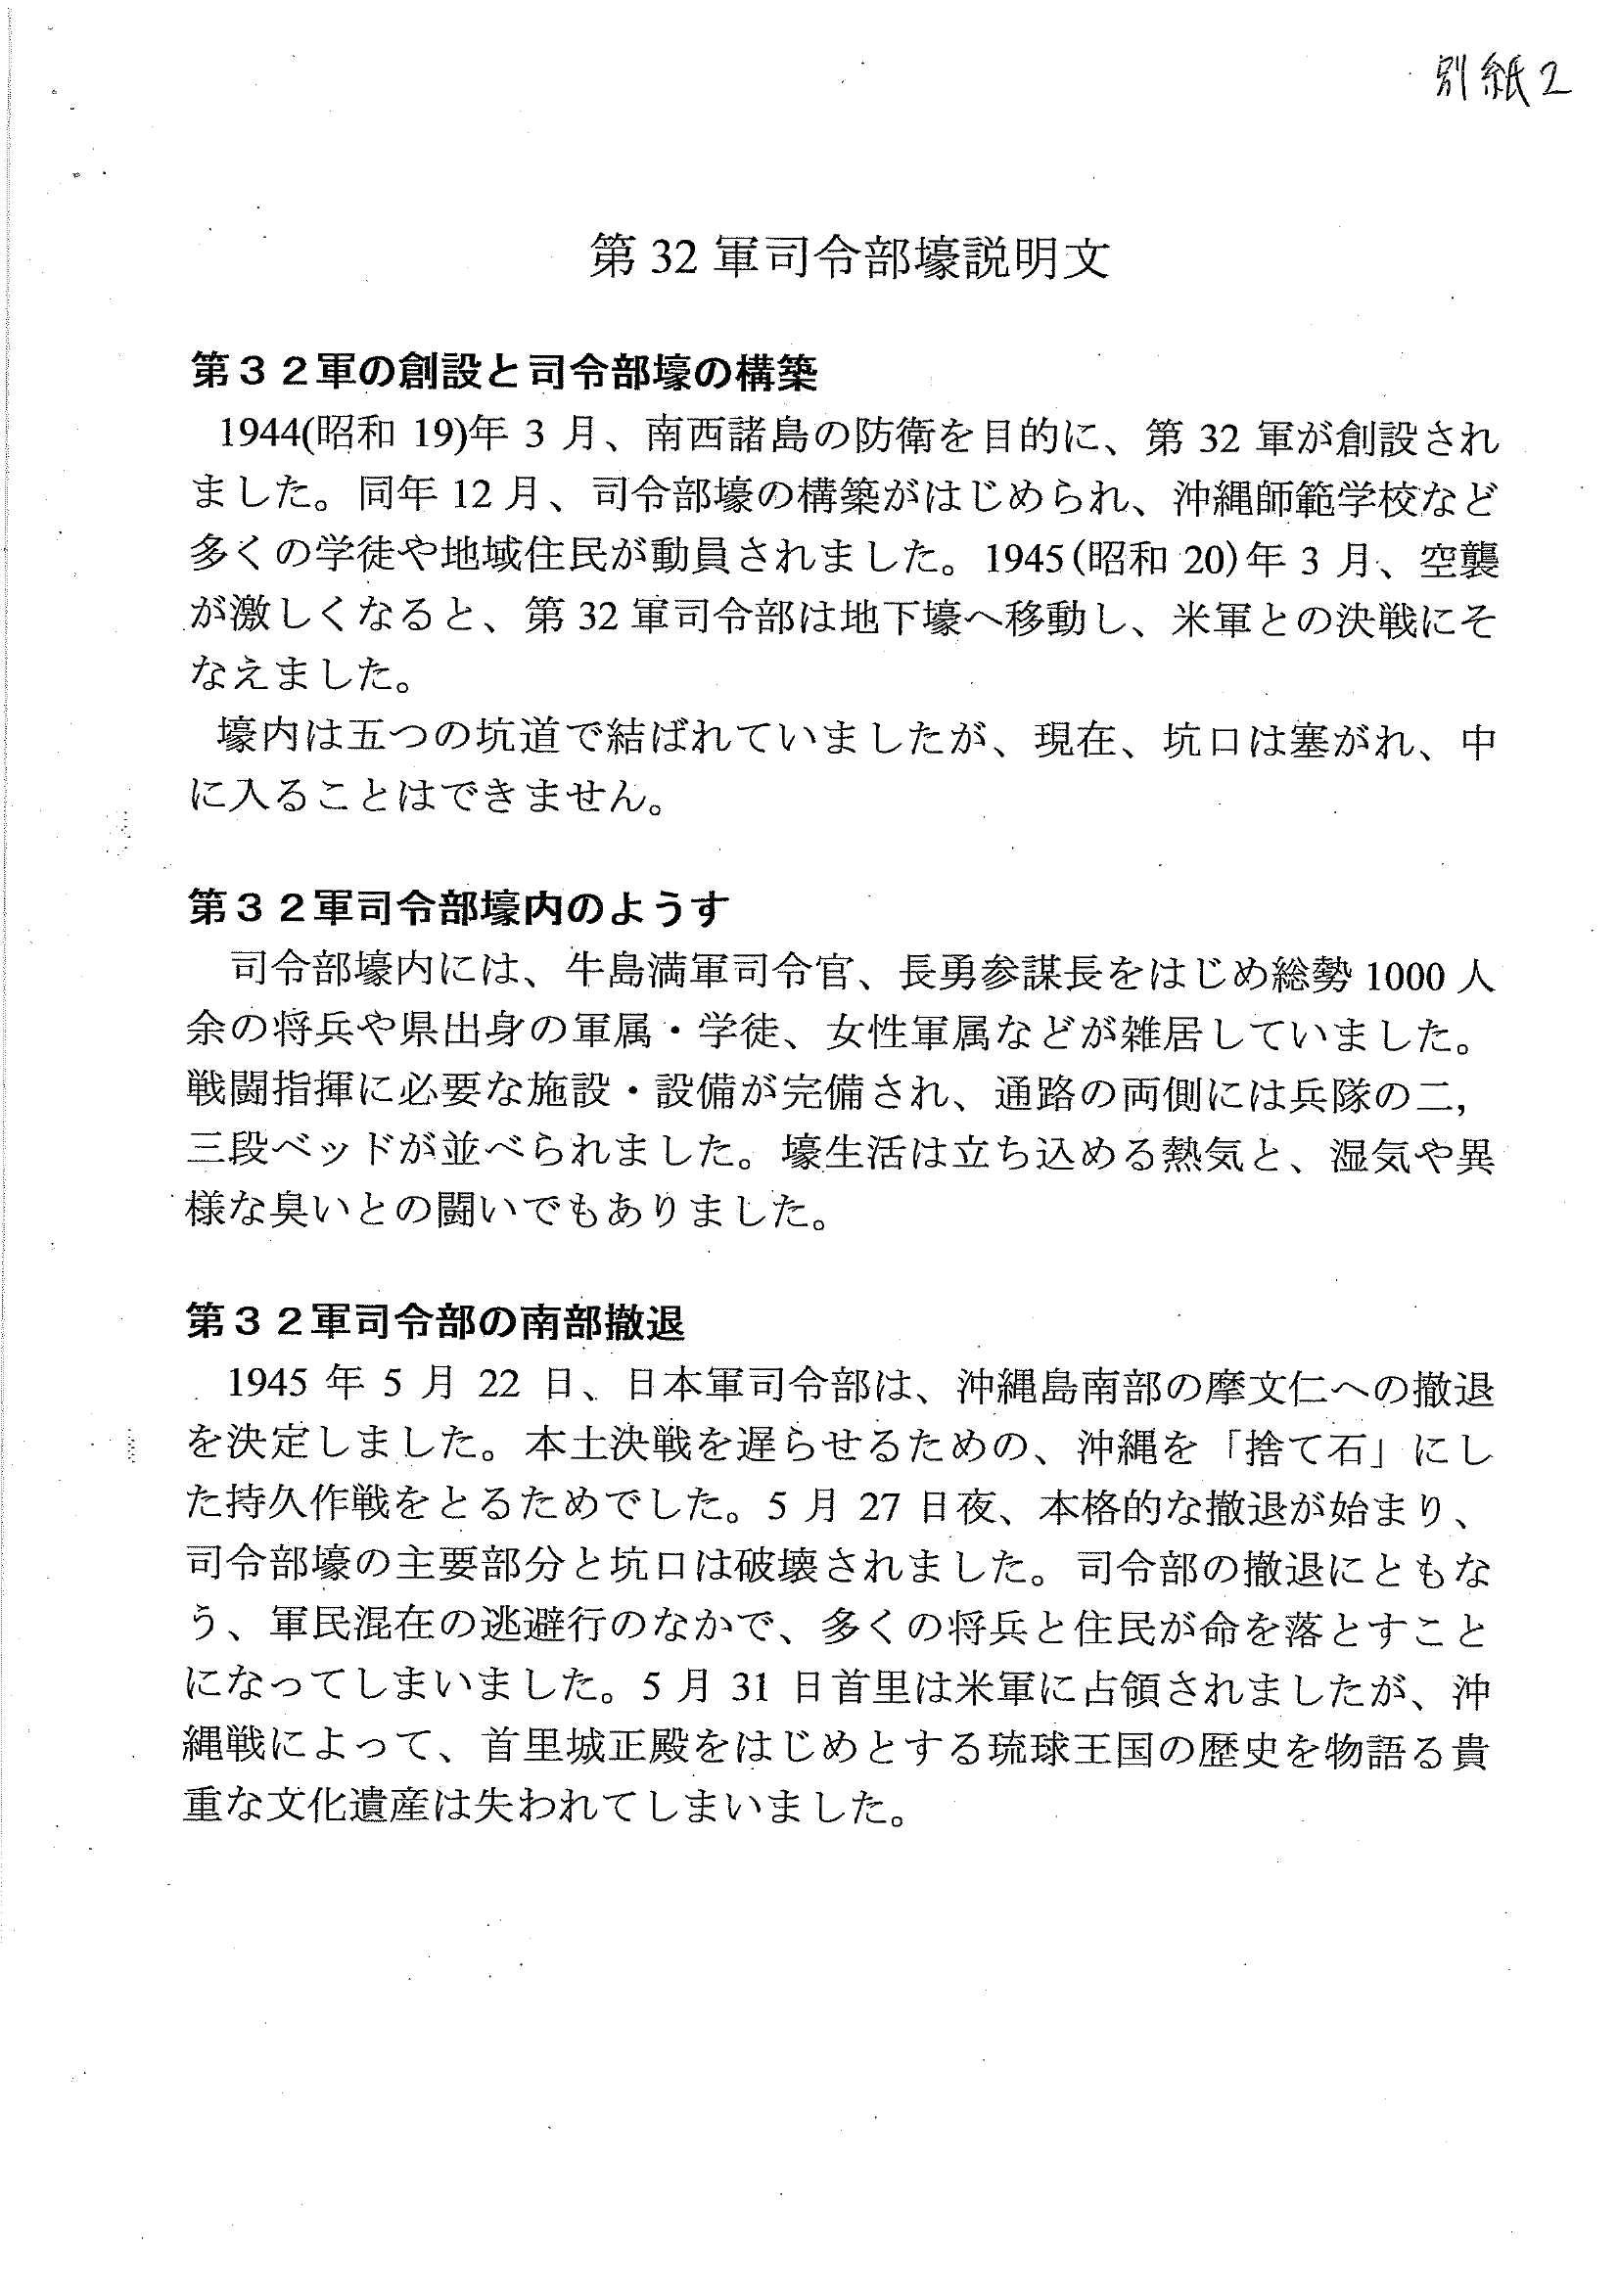 setumeibun_kensyusei-1.jpg